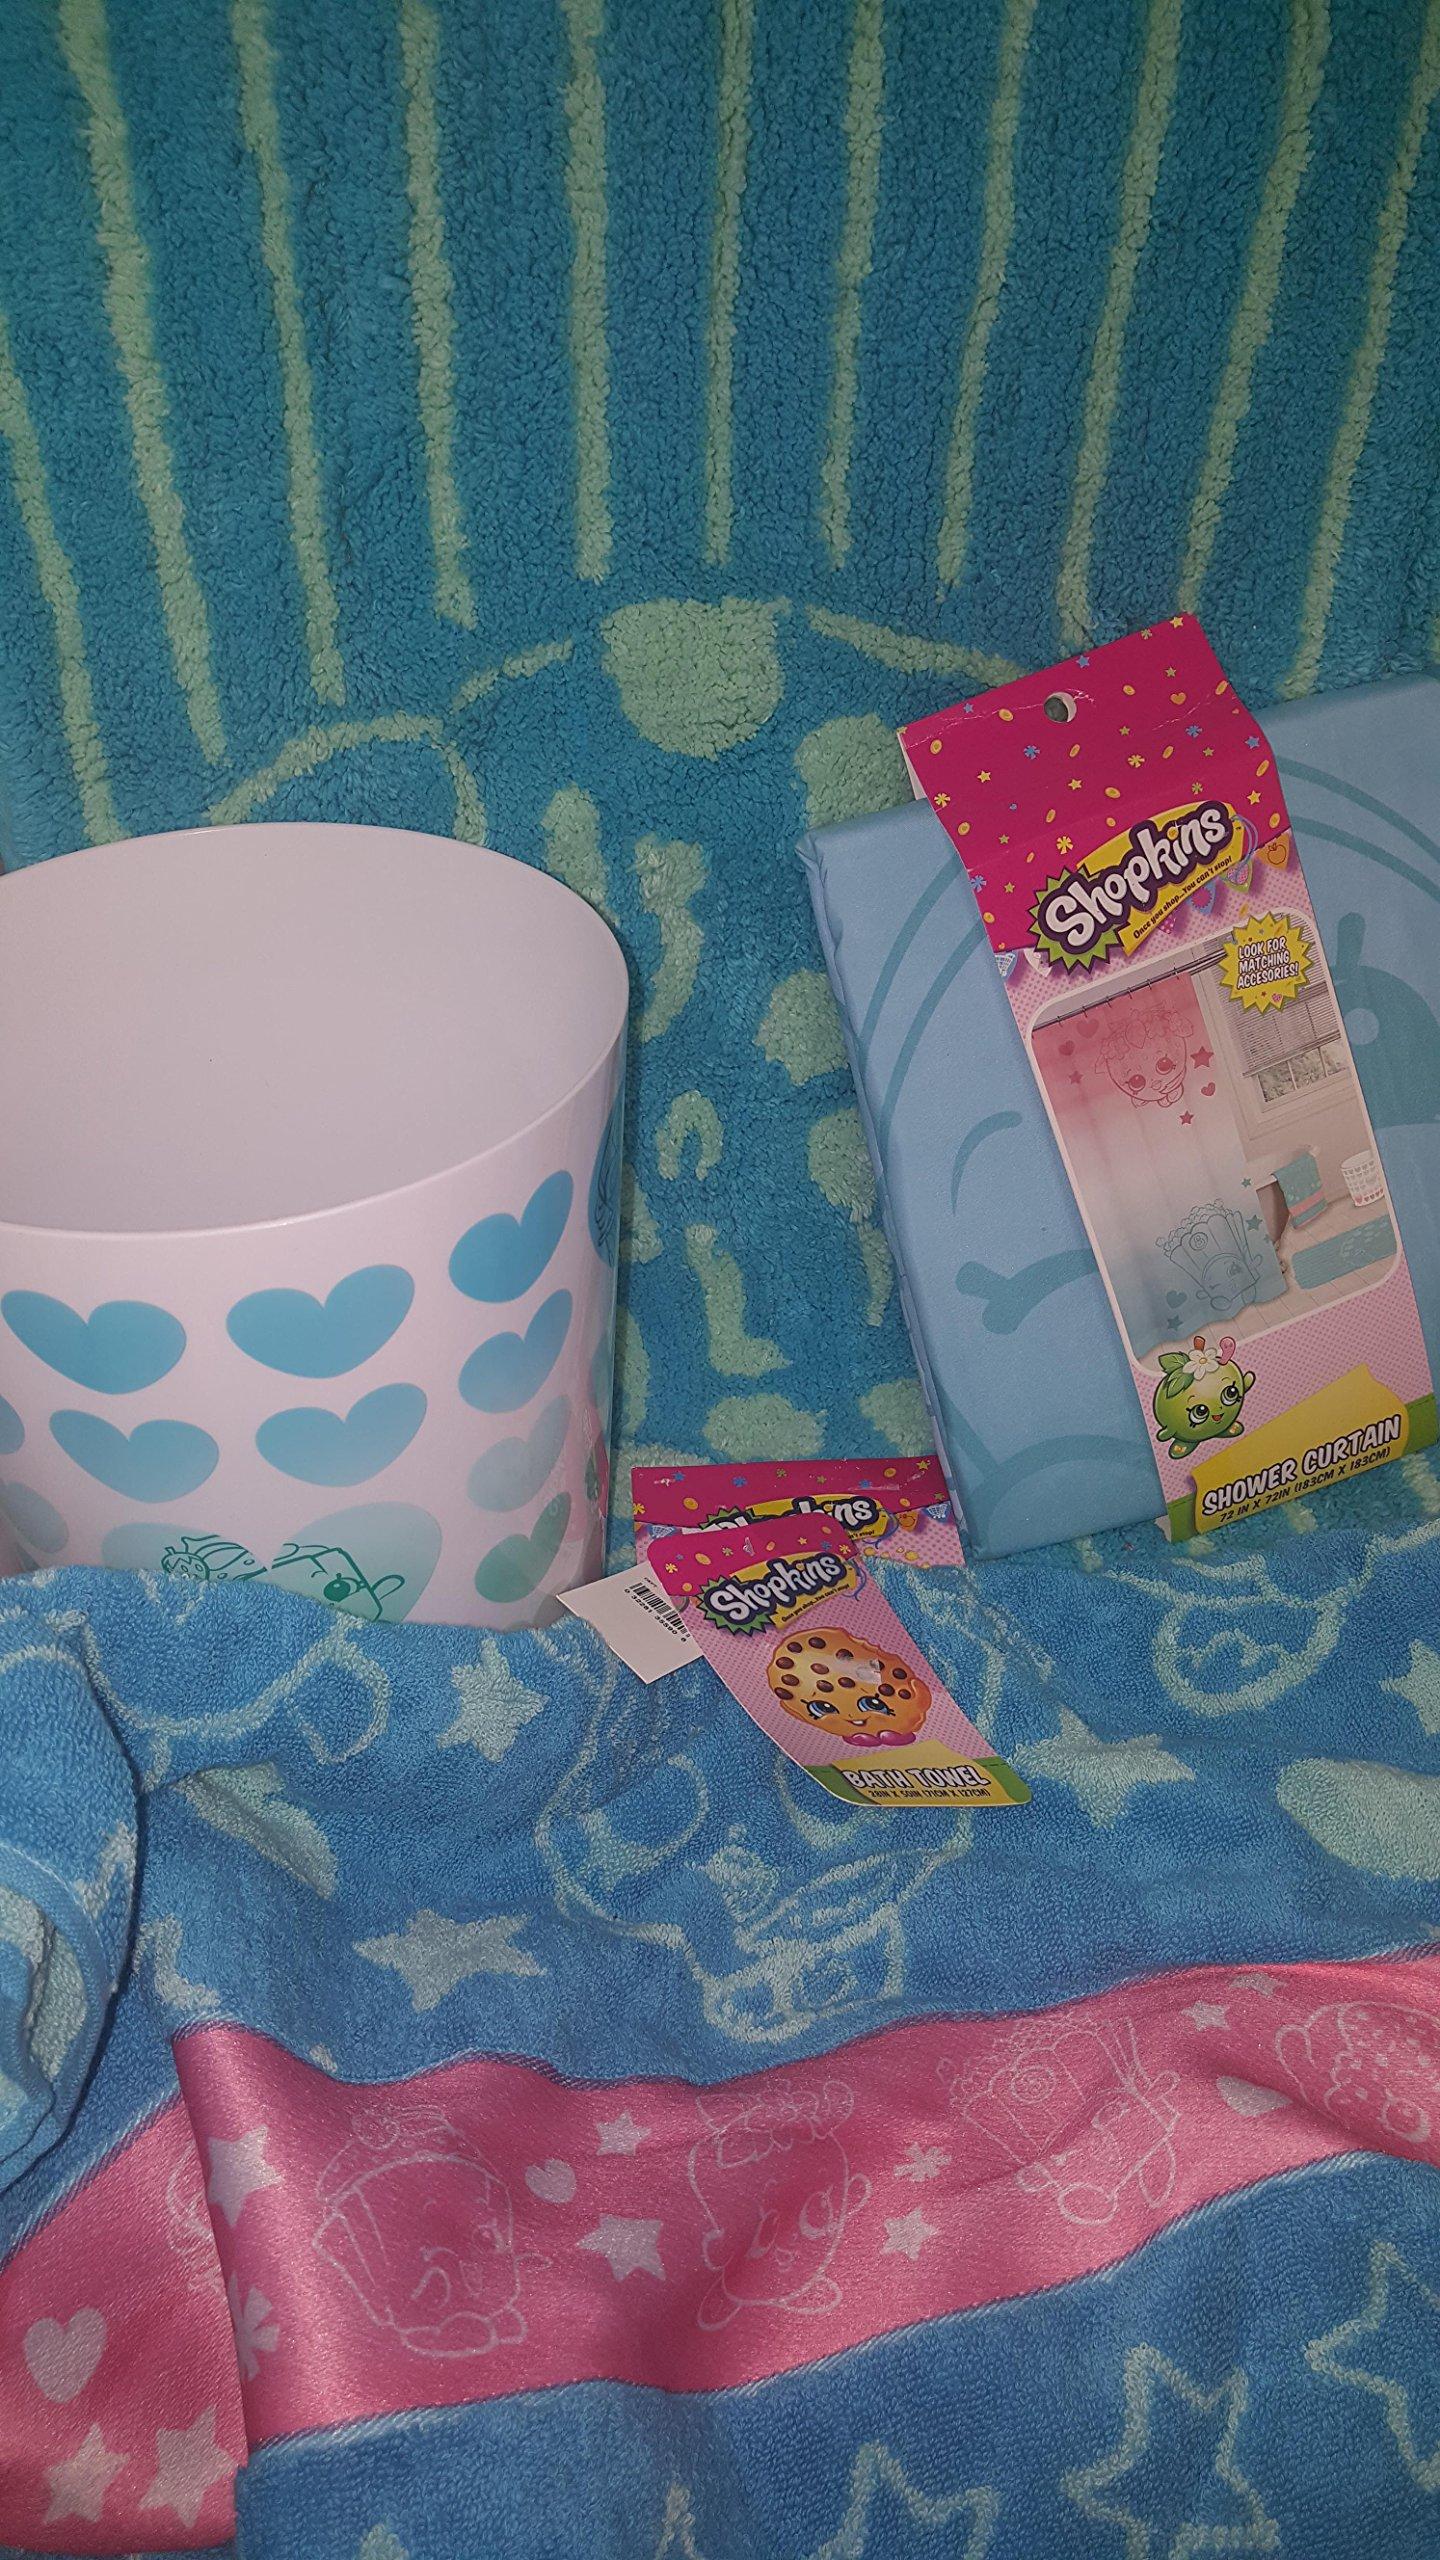 Shopkins Bathroom Bath Time Bundle, Trash Can, Towel, Rug, Shower Curtain